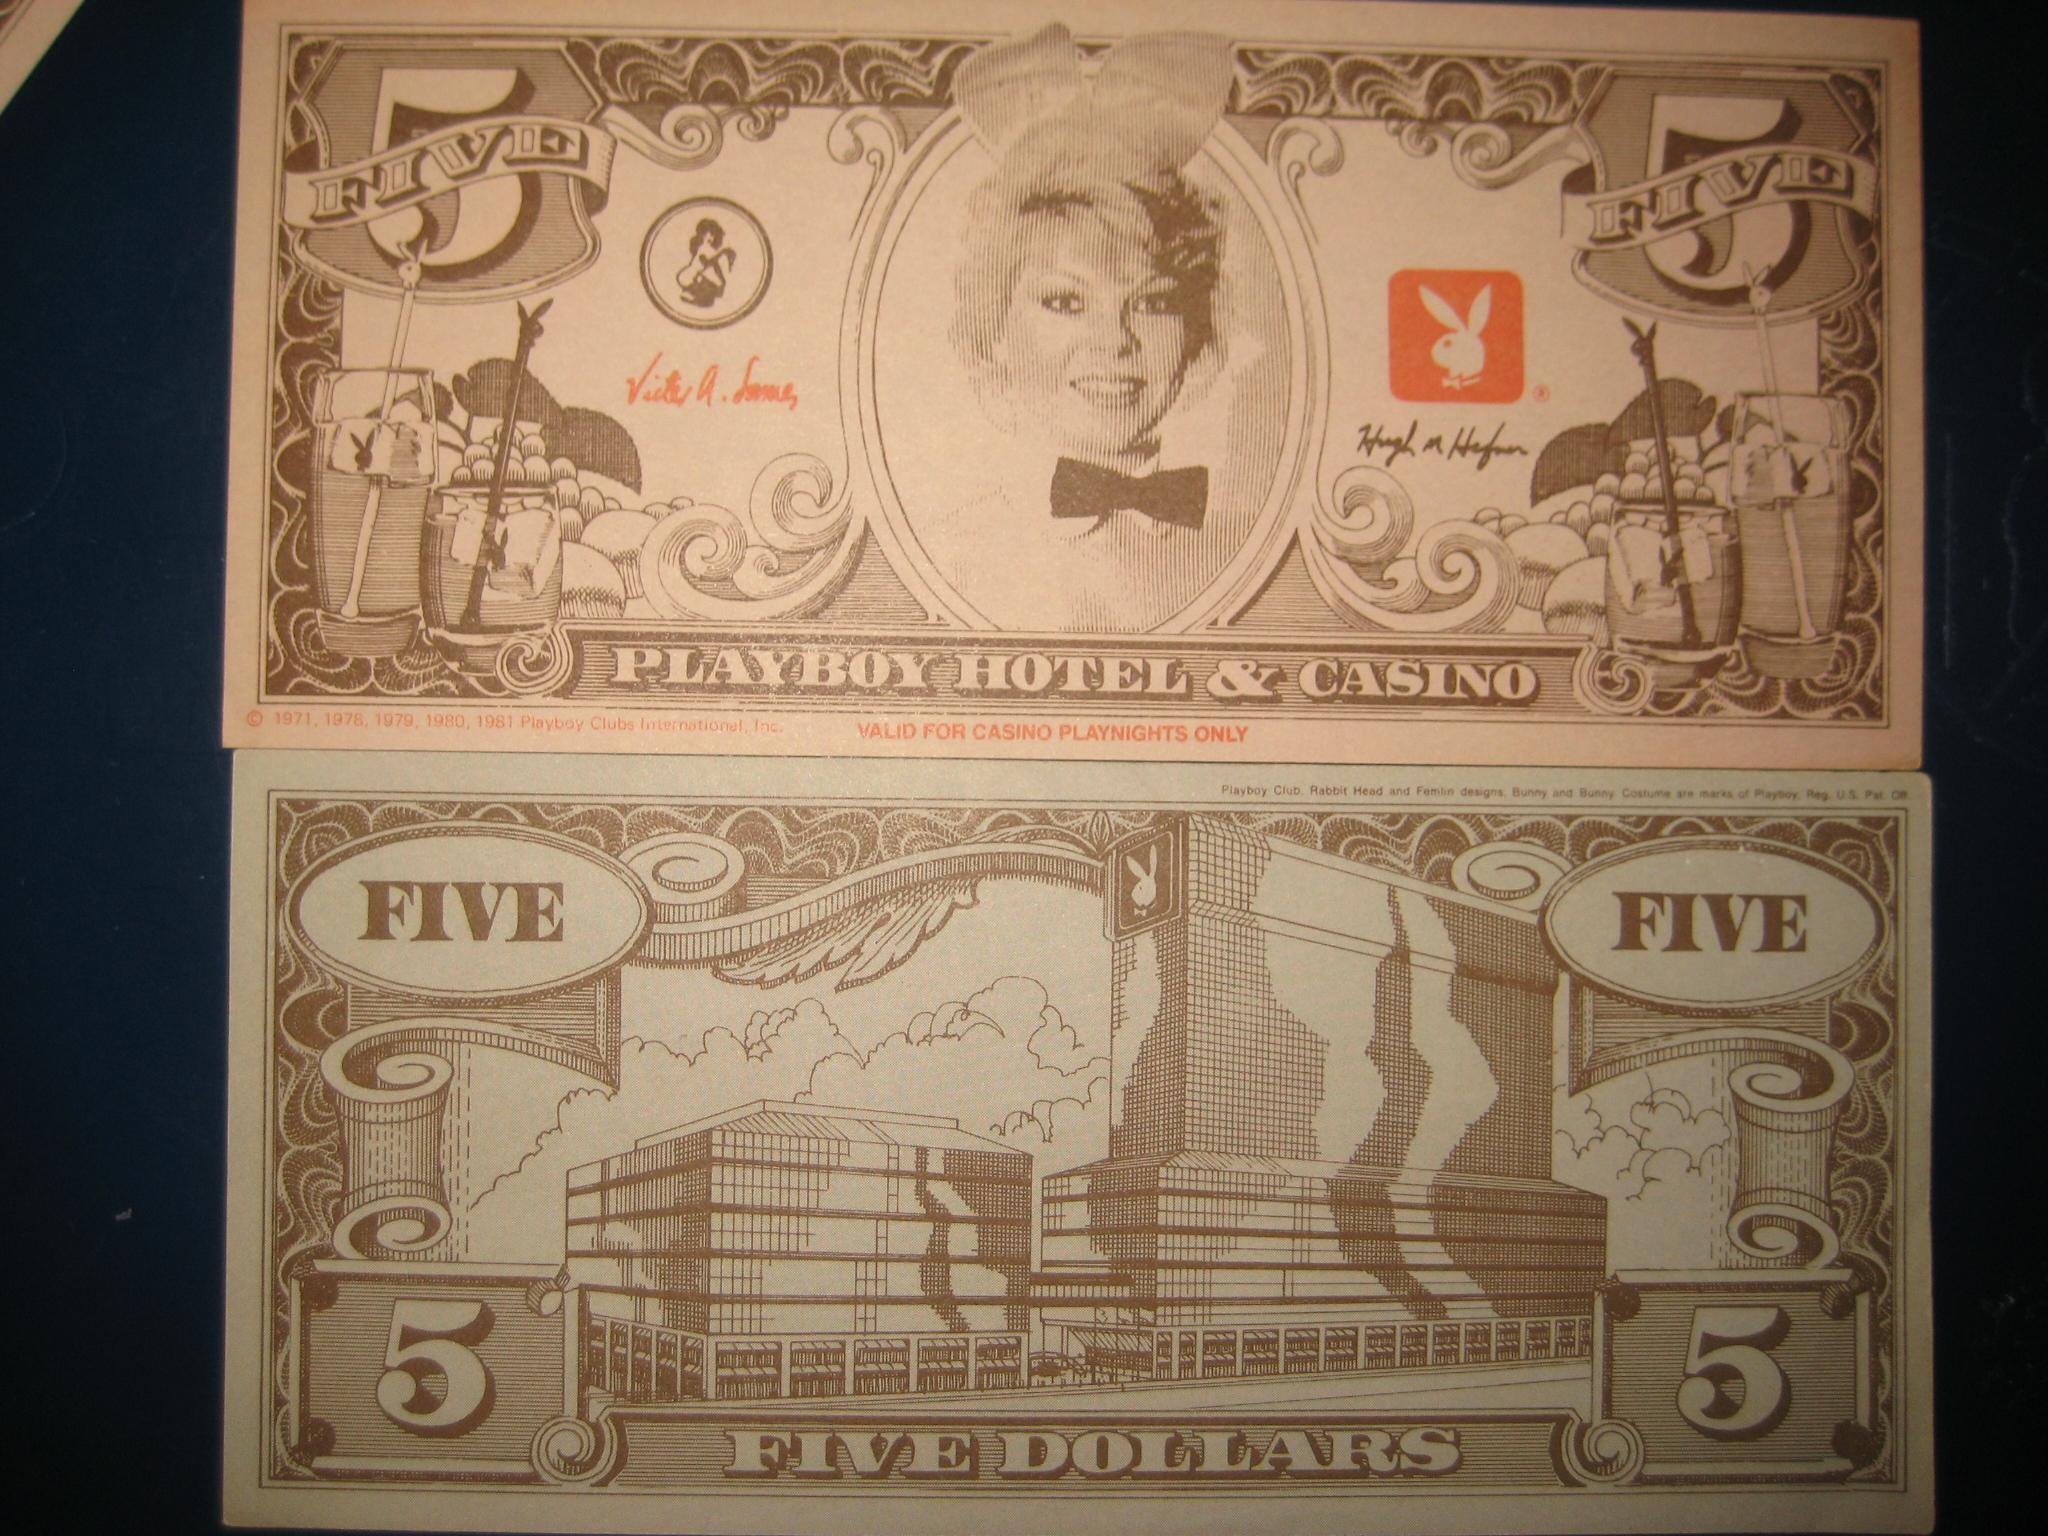 $5 Dollars Playboy Casino Playnight